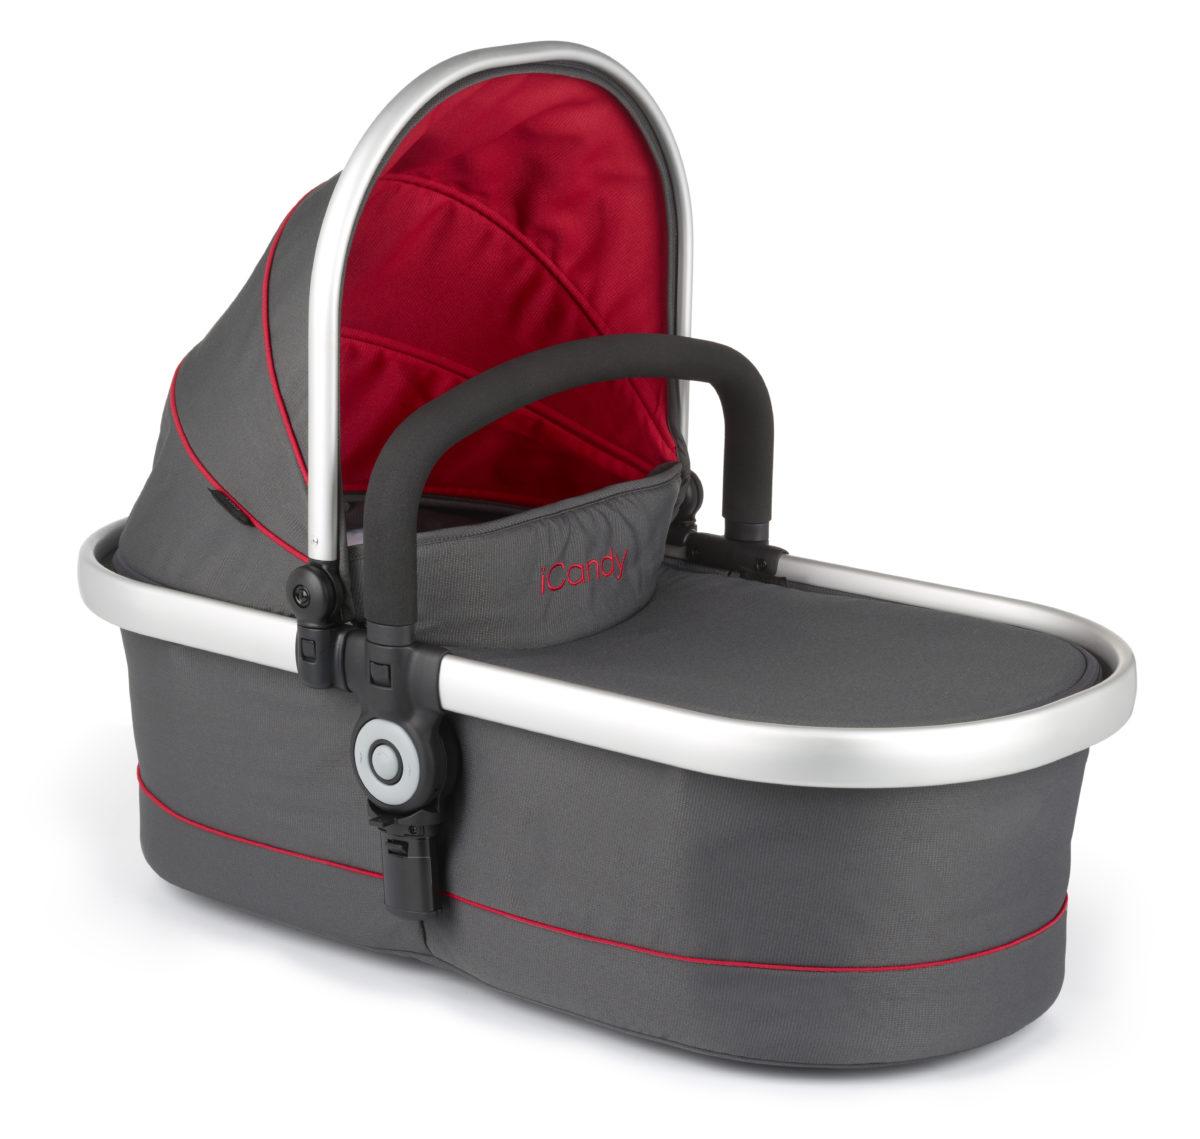 iCandy Peach All Terrain - Pushchair -  Carry Cot -  PACE-jpg